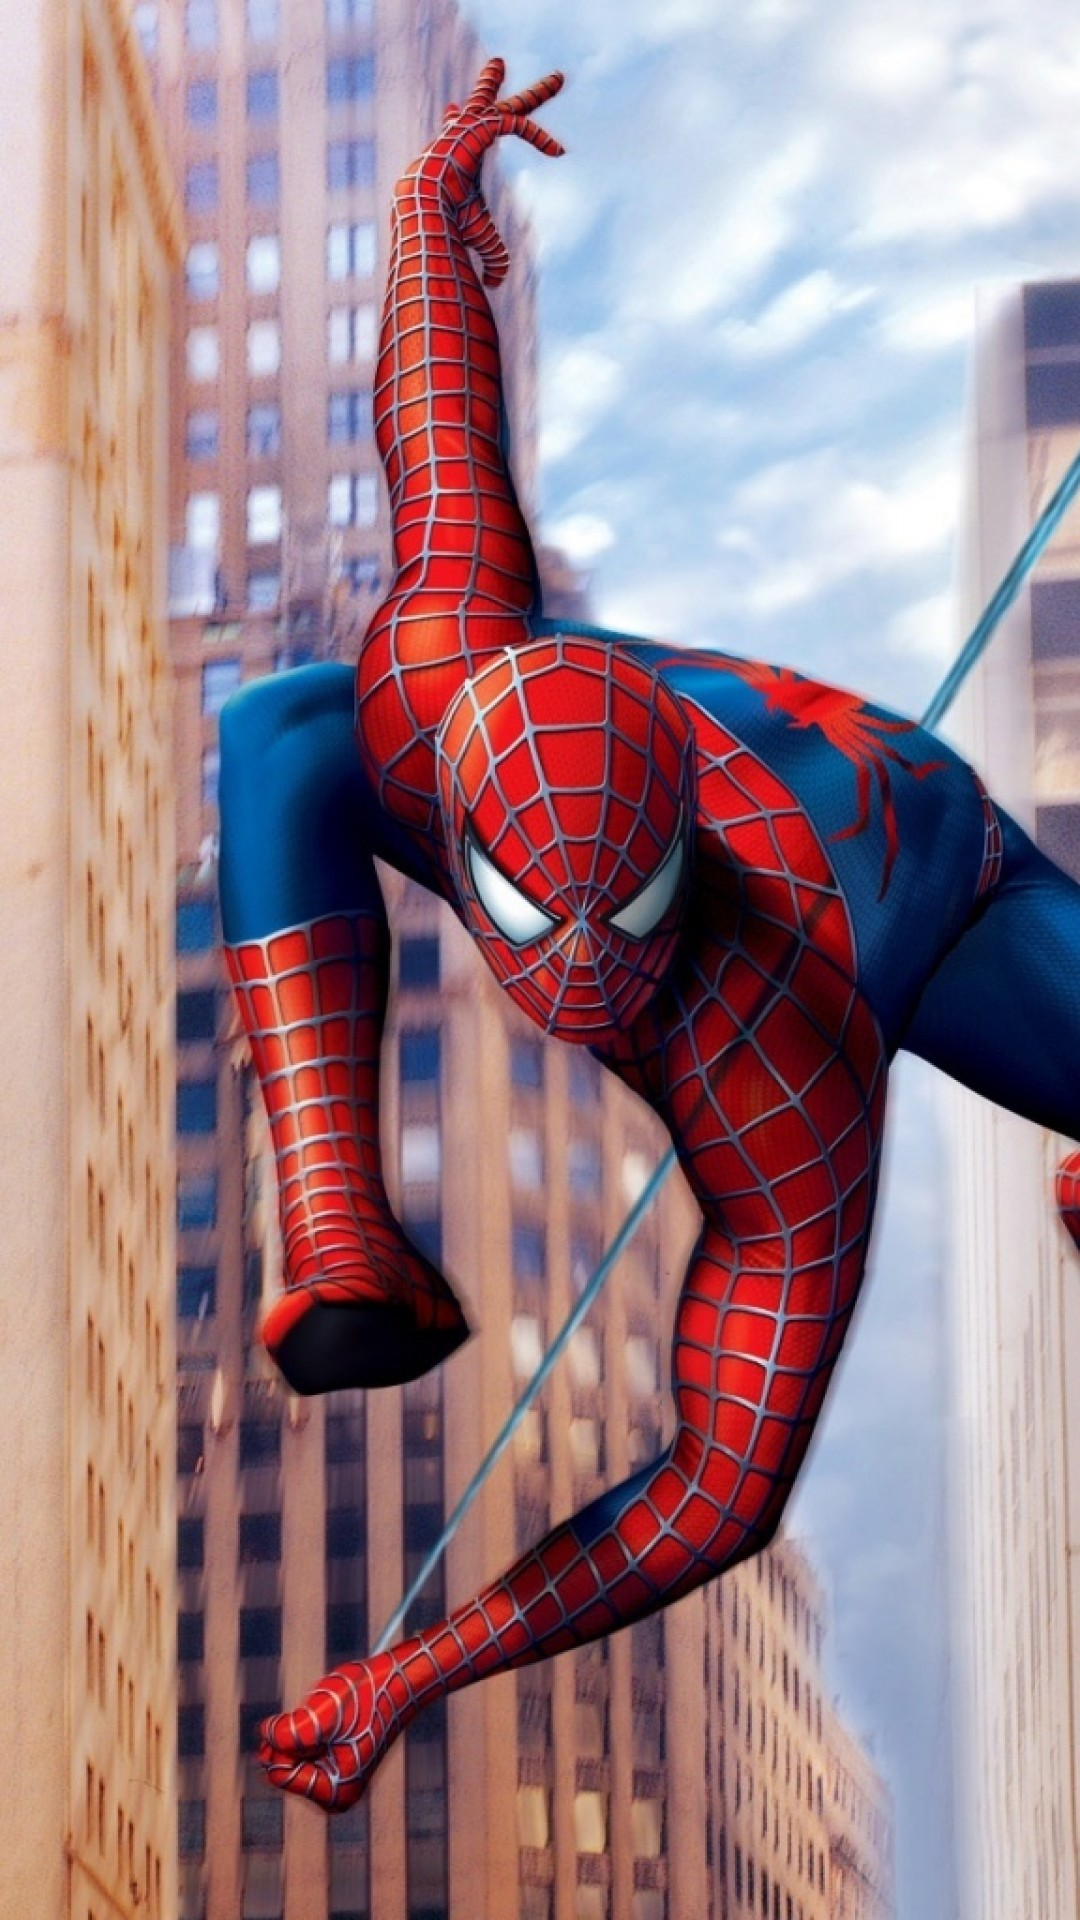 Spiderman Superhero Iphone Wallpaper Hd